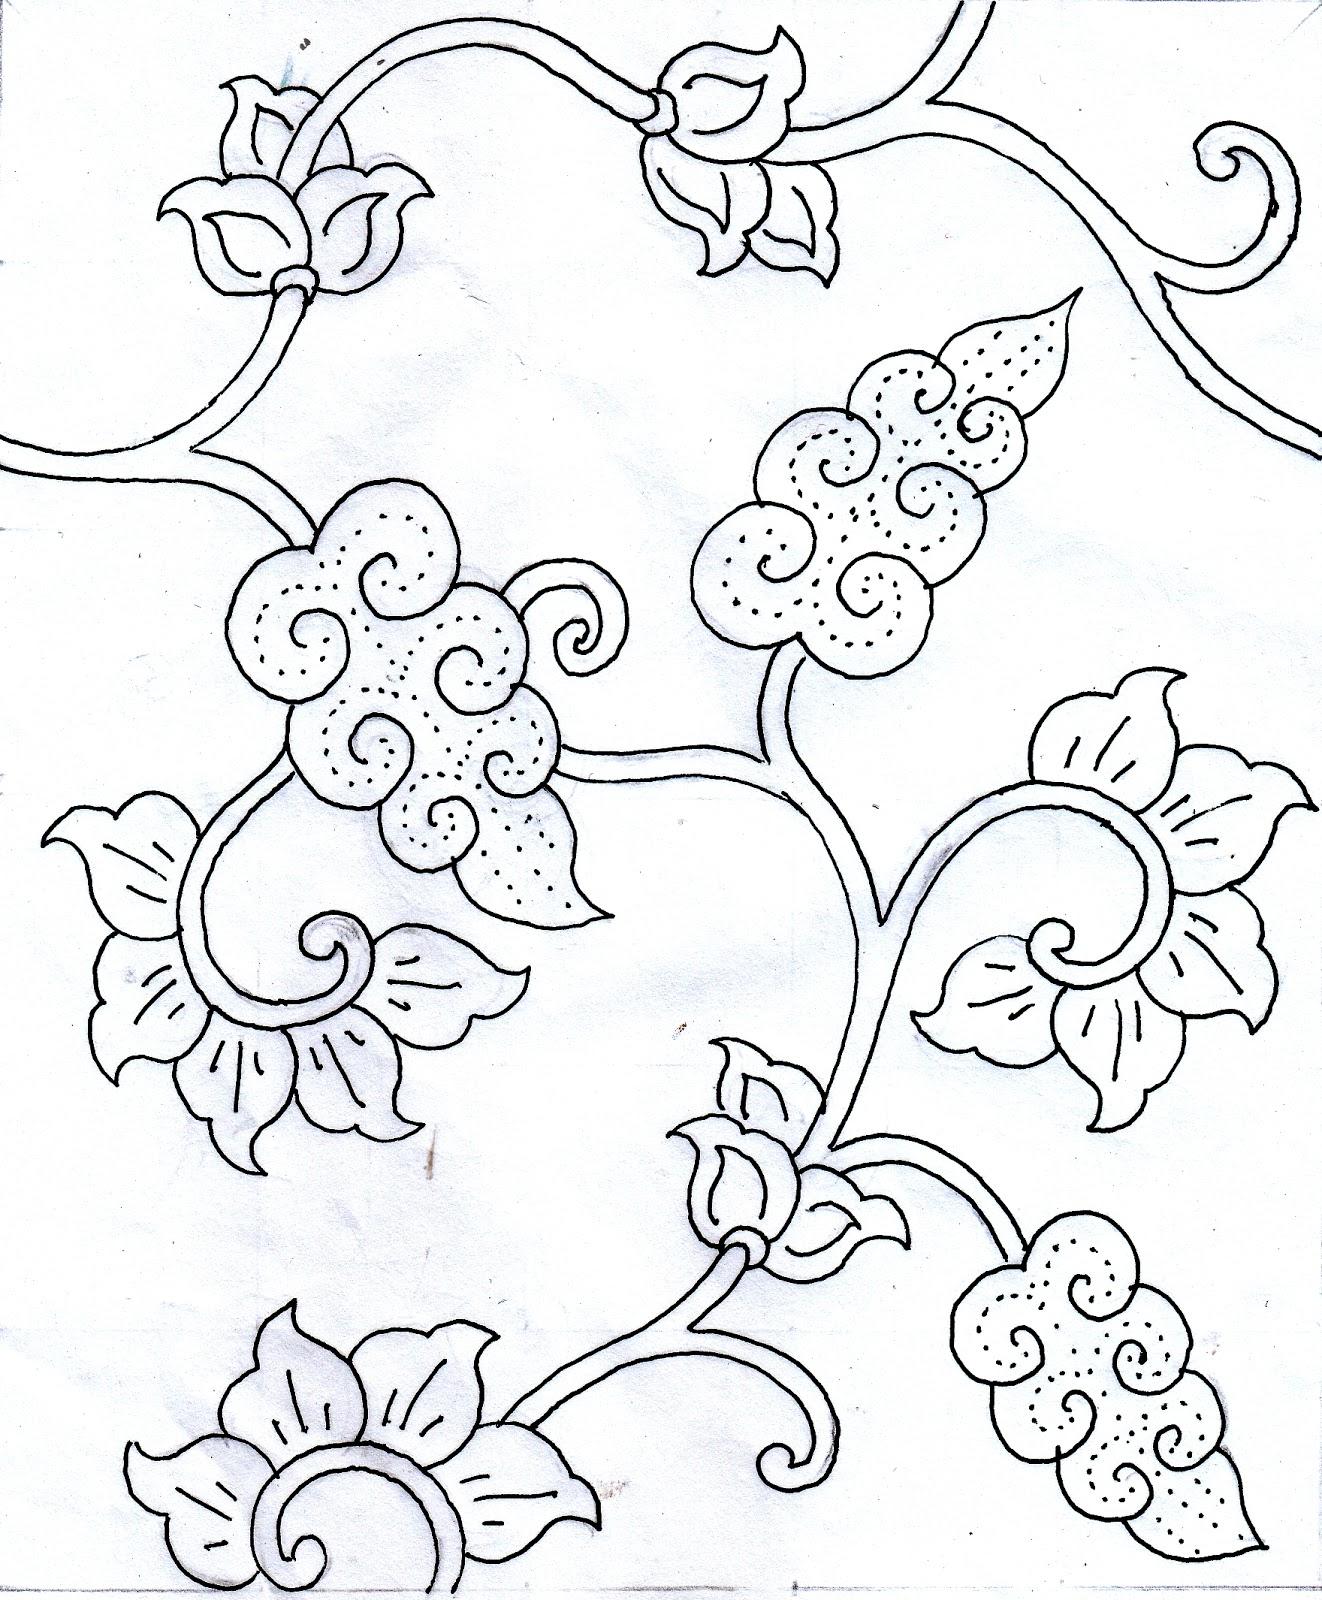 Sketsa Batik Bunga : sketsa, batik, bunga, Gambar, Mewarnai, Motif, Batik, Sederhana